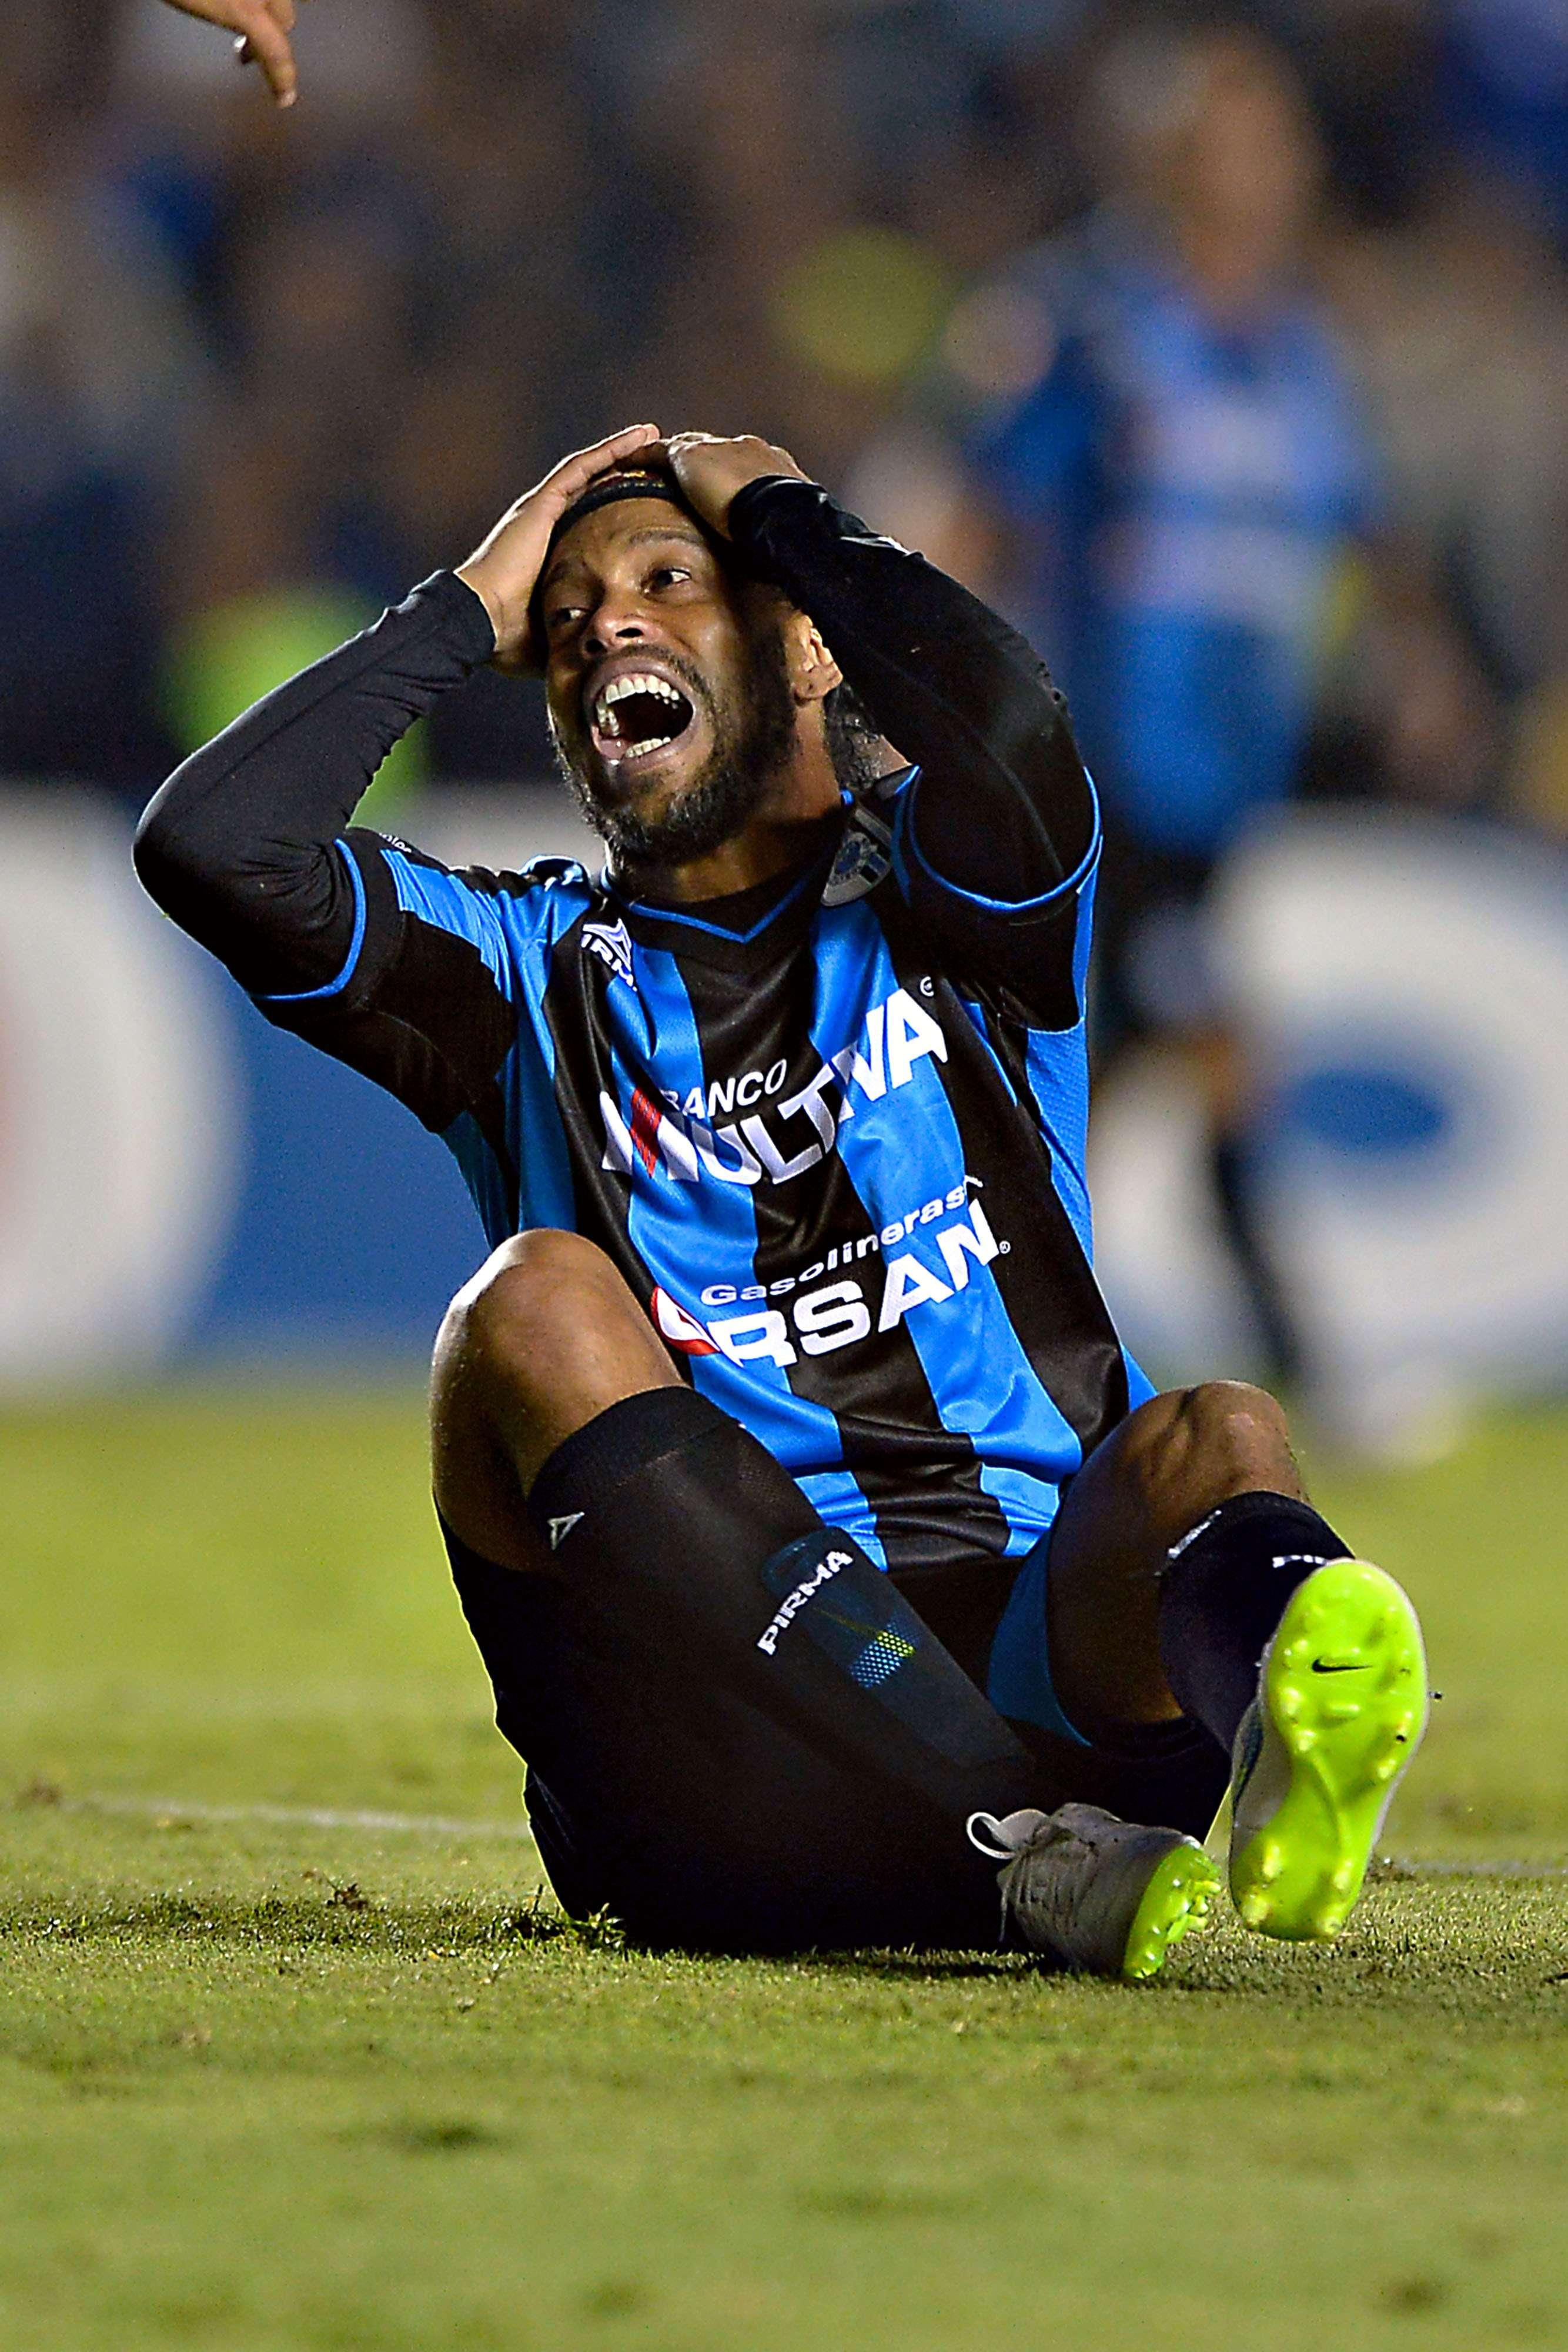 Ronaldinho pidió un penal que no le marcaron. Foto: Mexsport